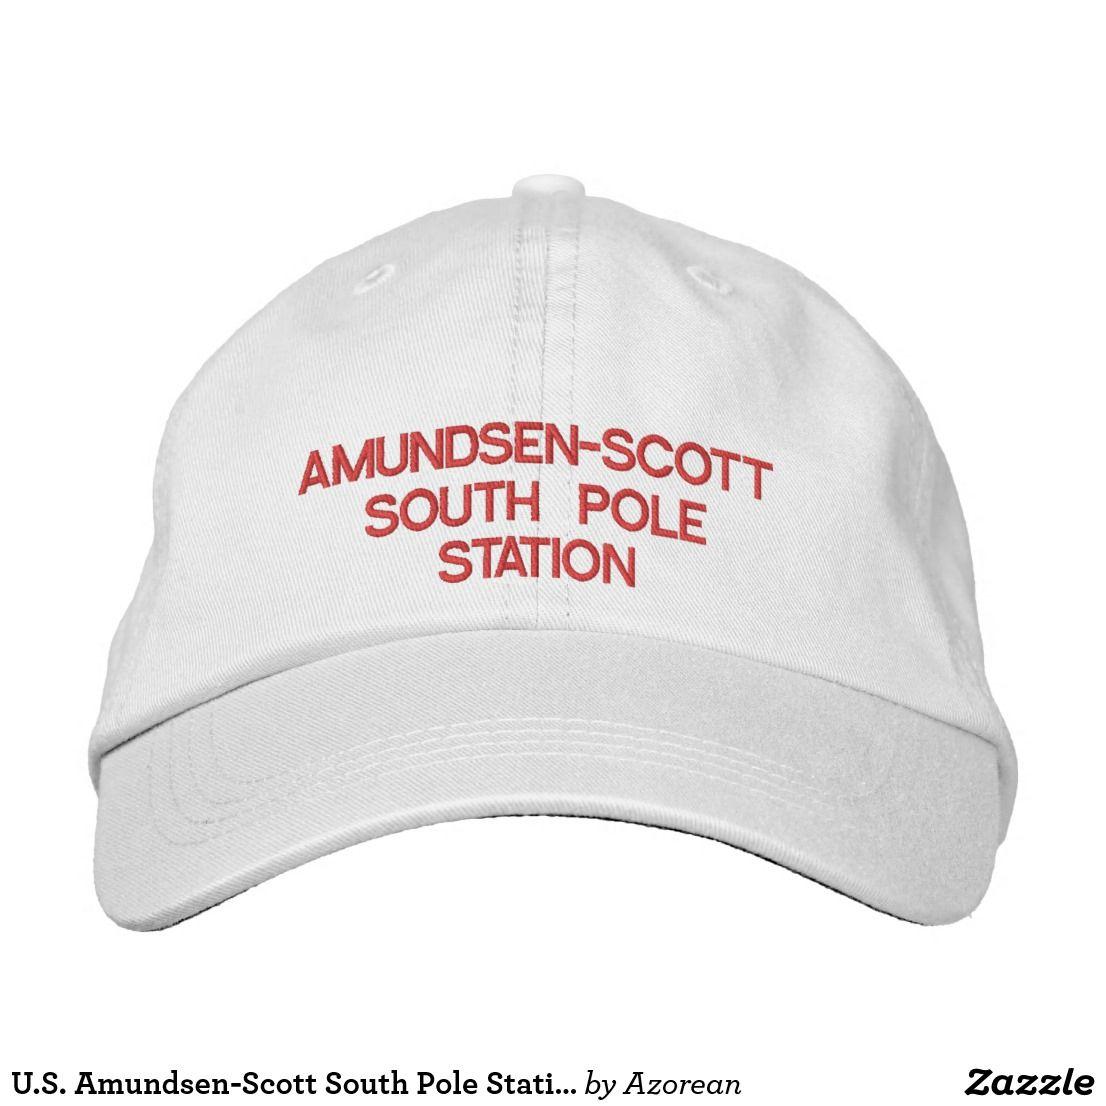 b6282f3b726ee U.S. Amundsen-Scott South Pole Station Hat. U.S. Amundsen-Scott South Pole  Station Hat Embroidered Baseball Caps